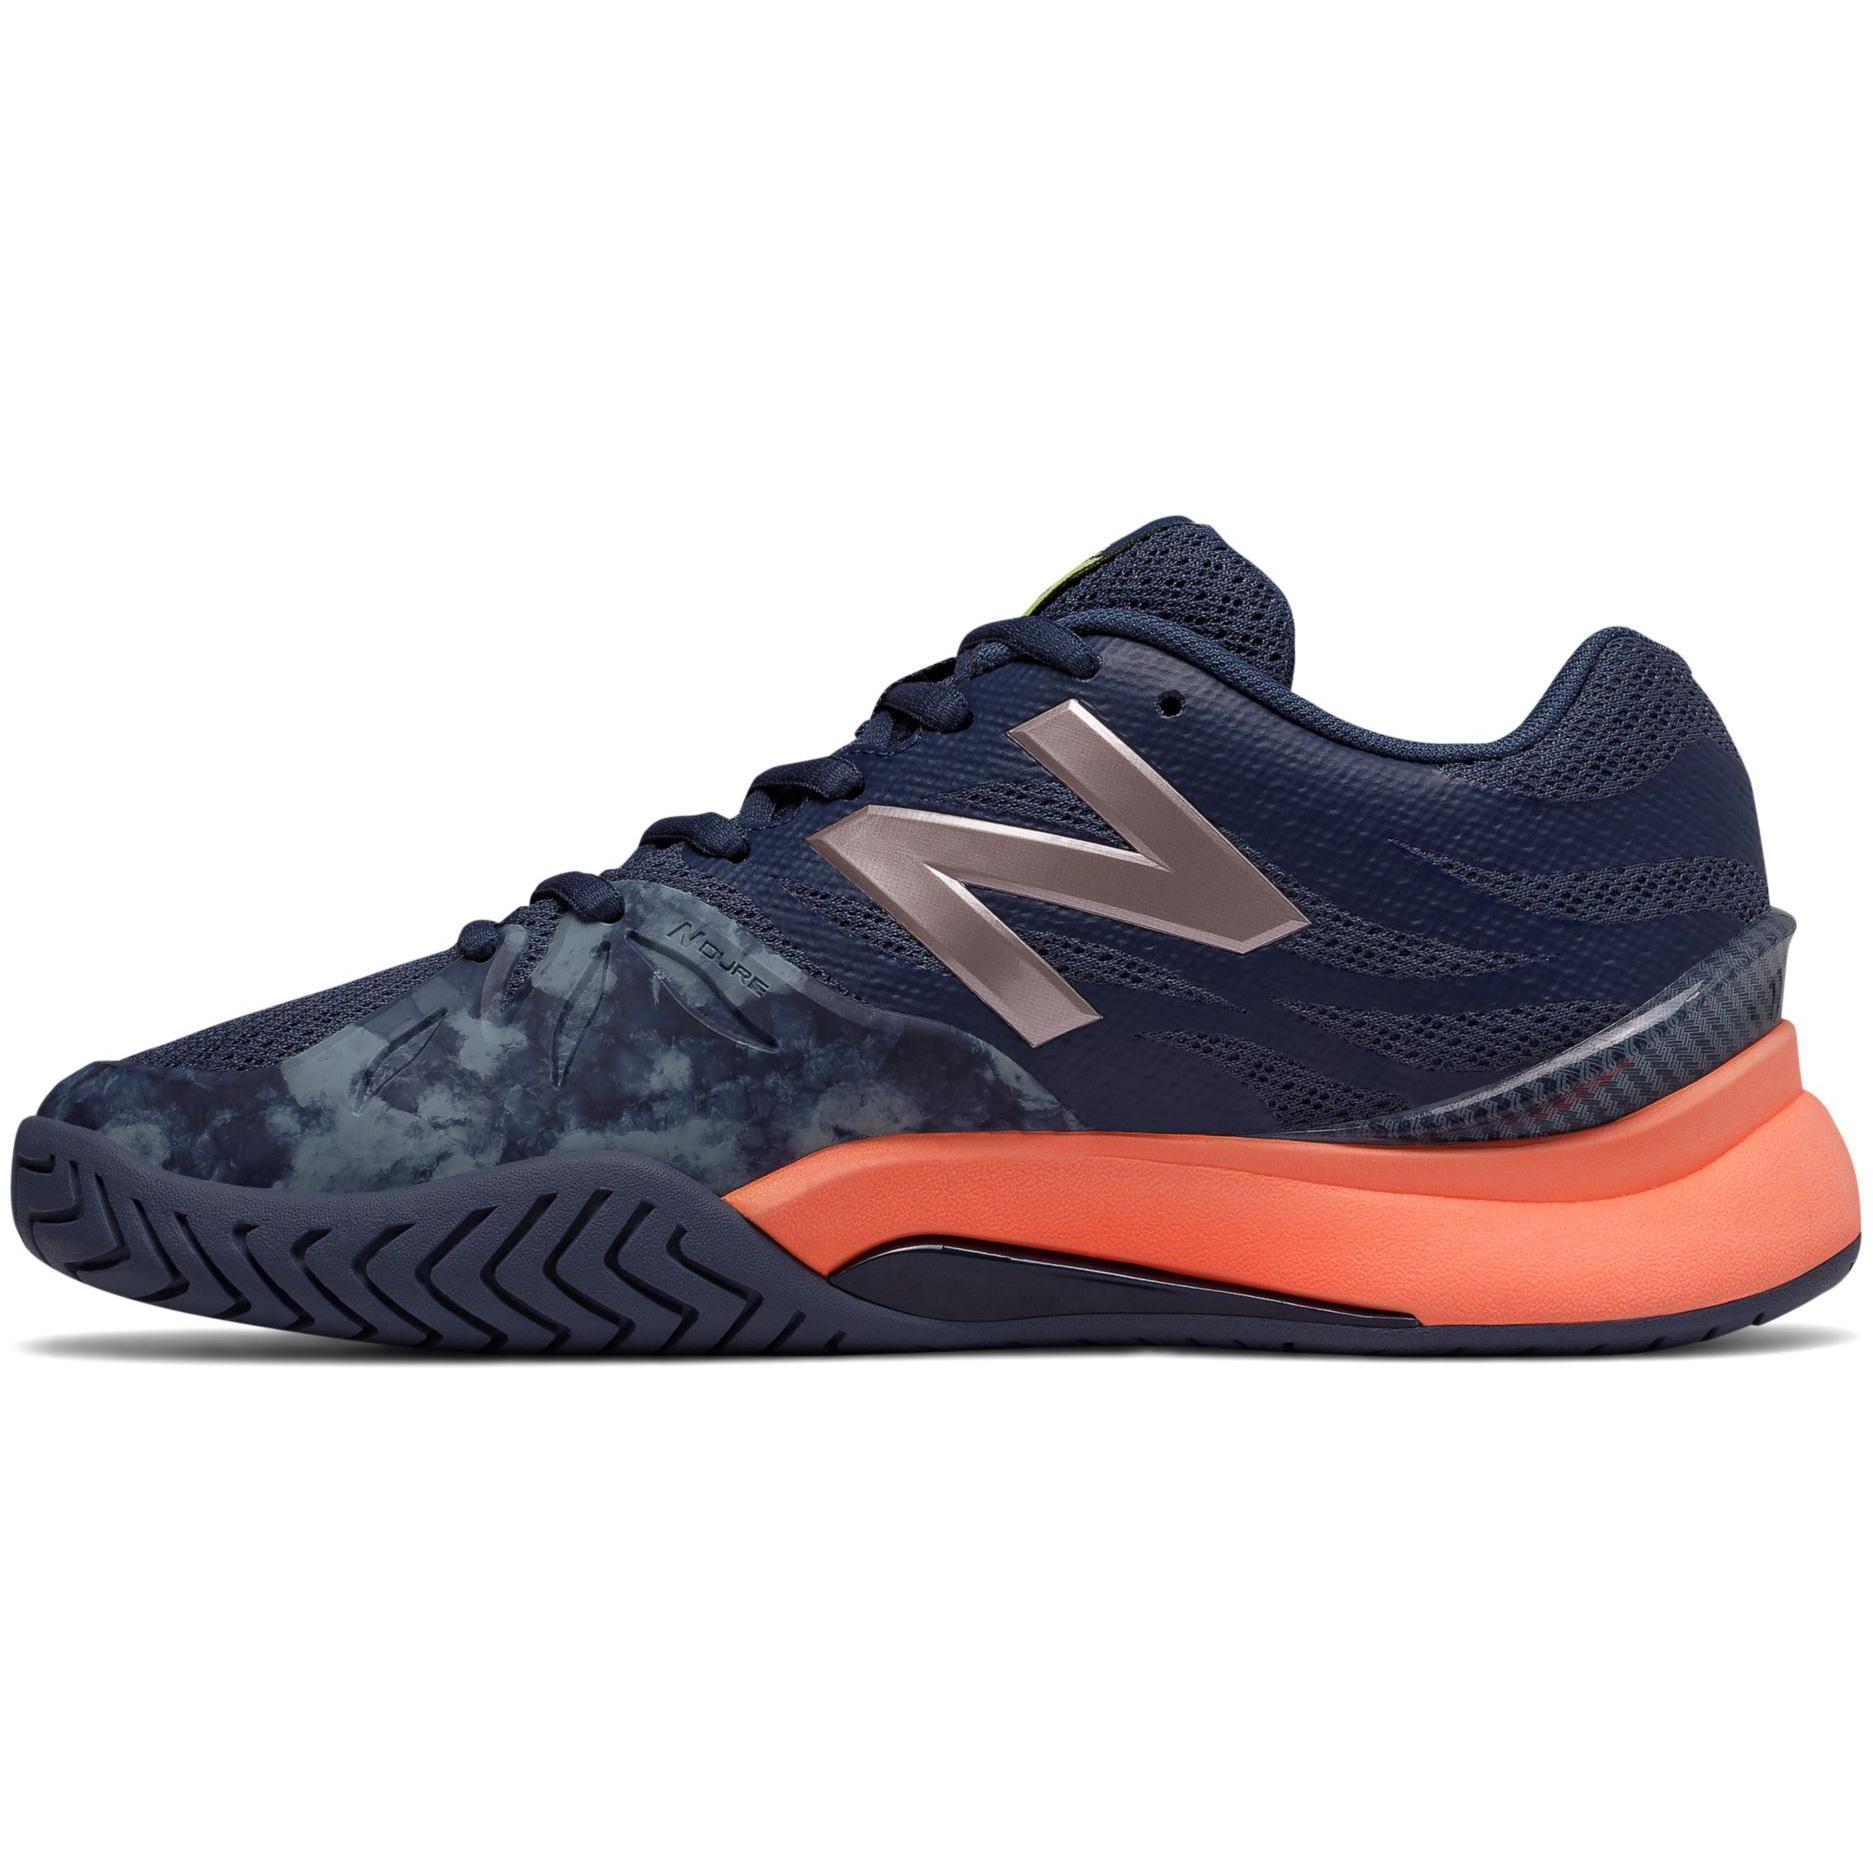 New Balance Womens 1296v2 Tennis Shoes